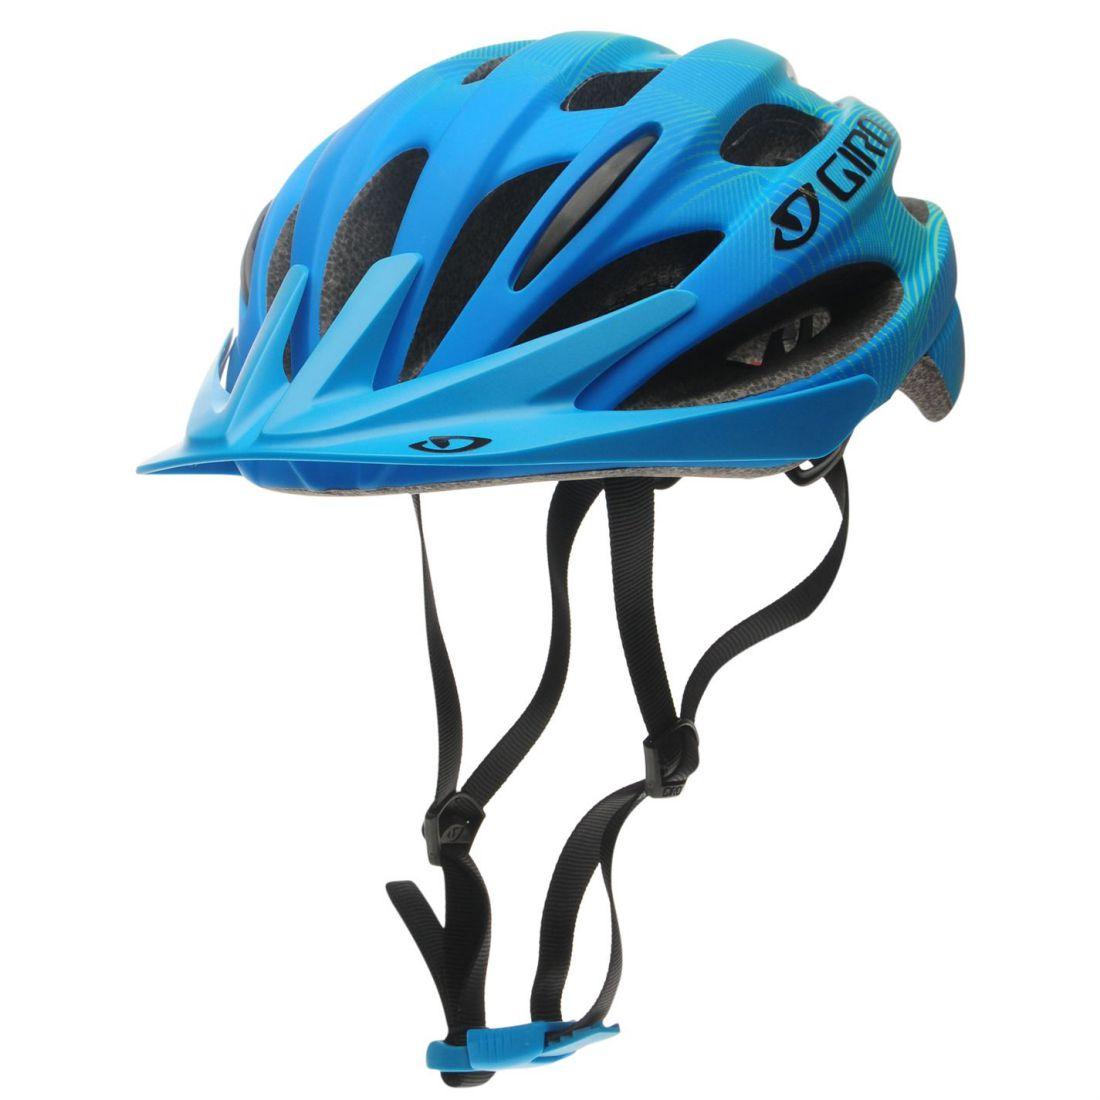 7608685dbaa61 Details about Giro Kids Boys Raze Cycling Helmet Junior Cycle Lightweight  Print All Over Block